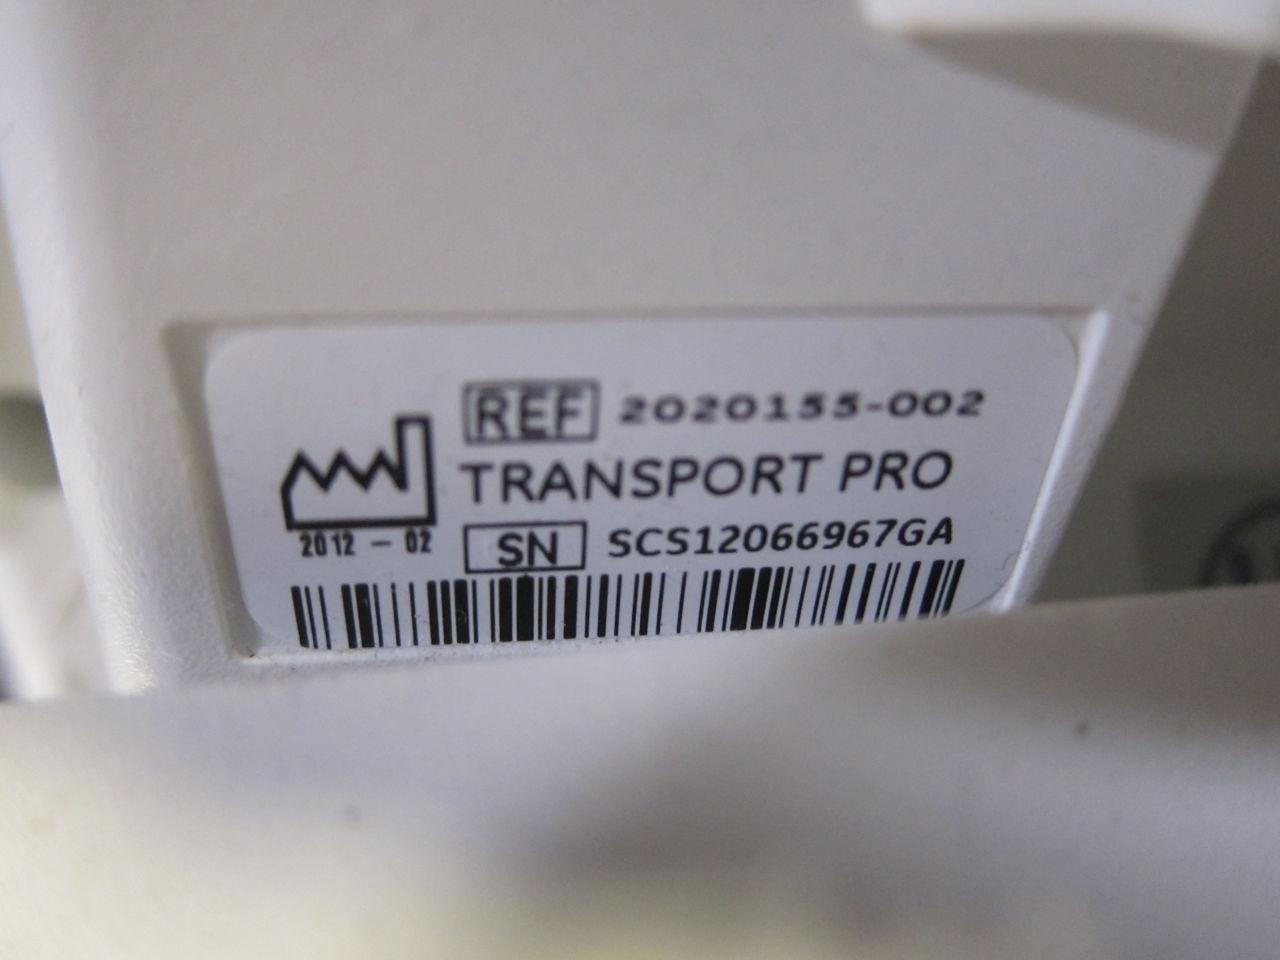 GE Transport Pro  - Lot of 3 Monitor